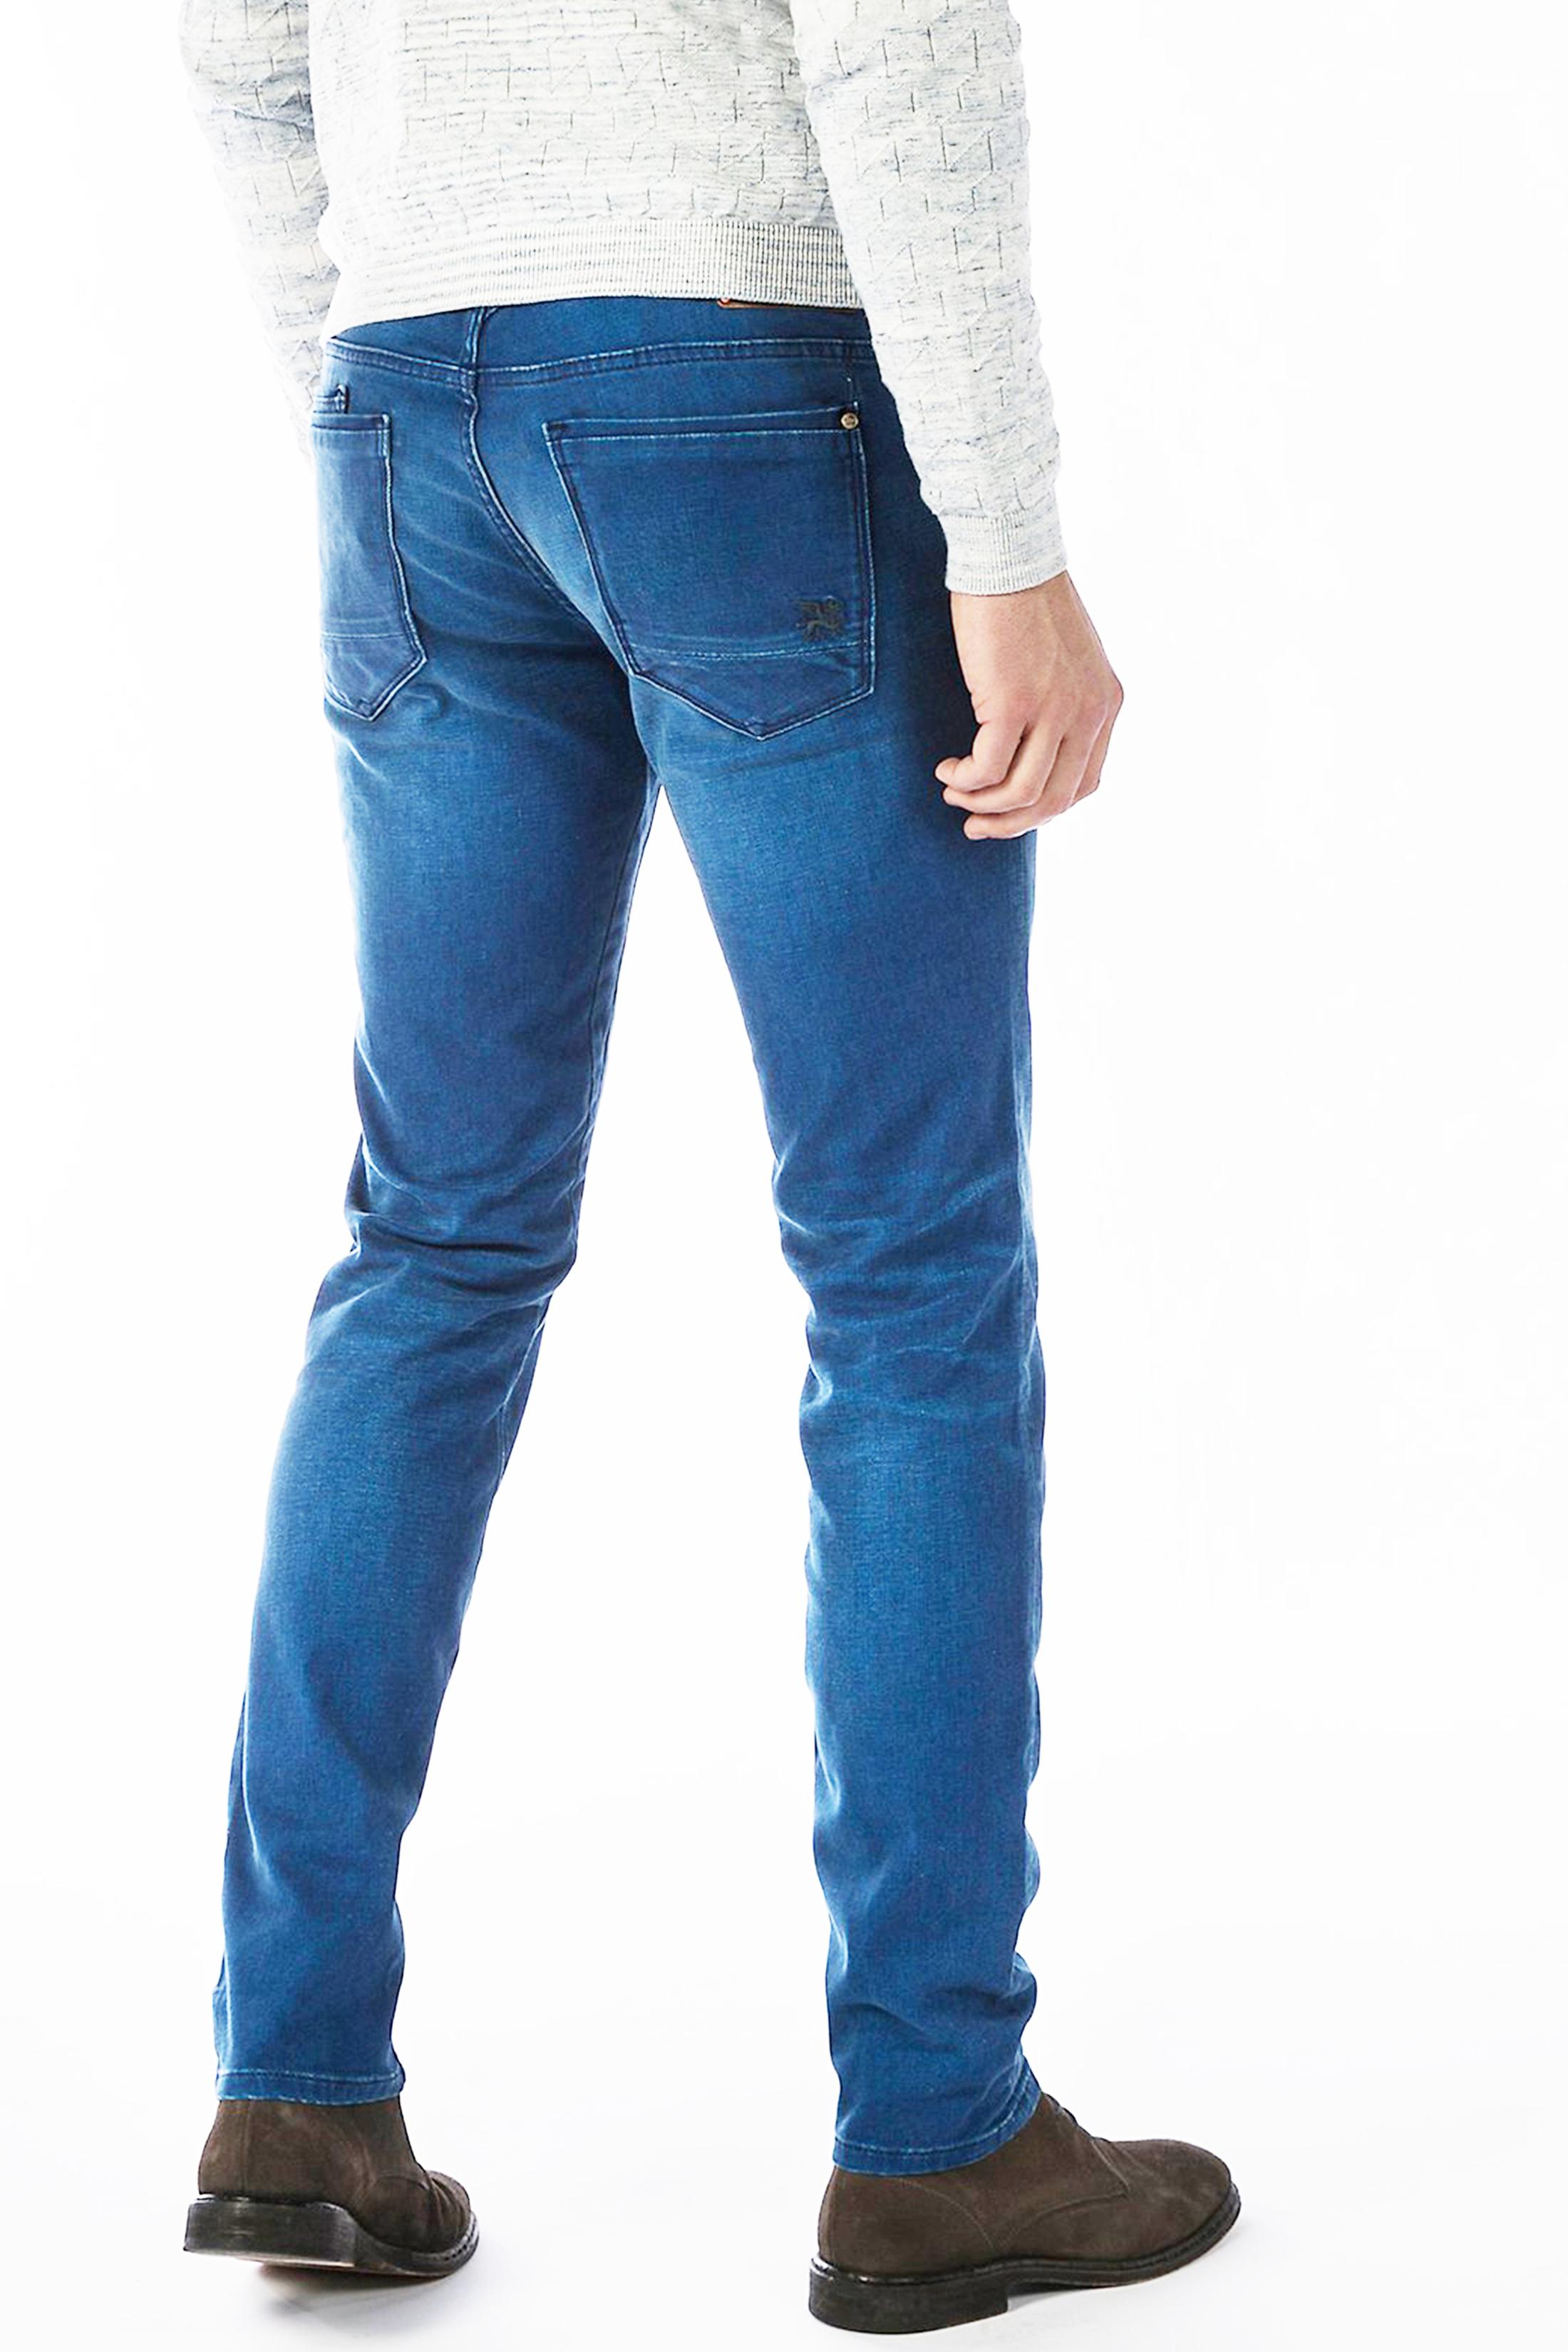 Vanguard V8 Jeans Blau foto 6